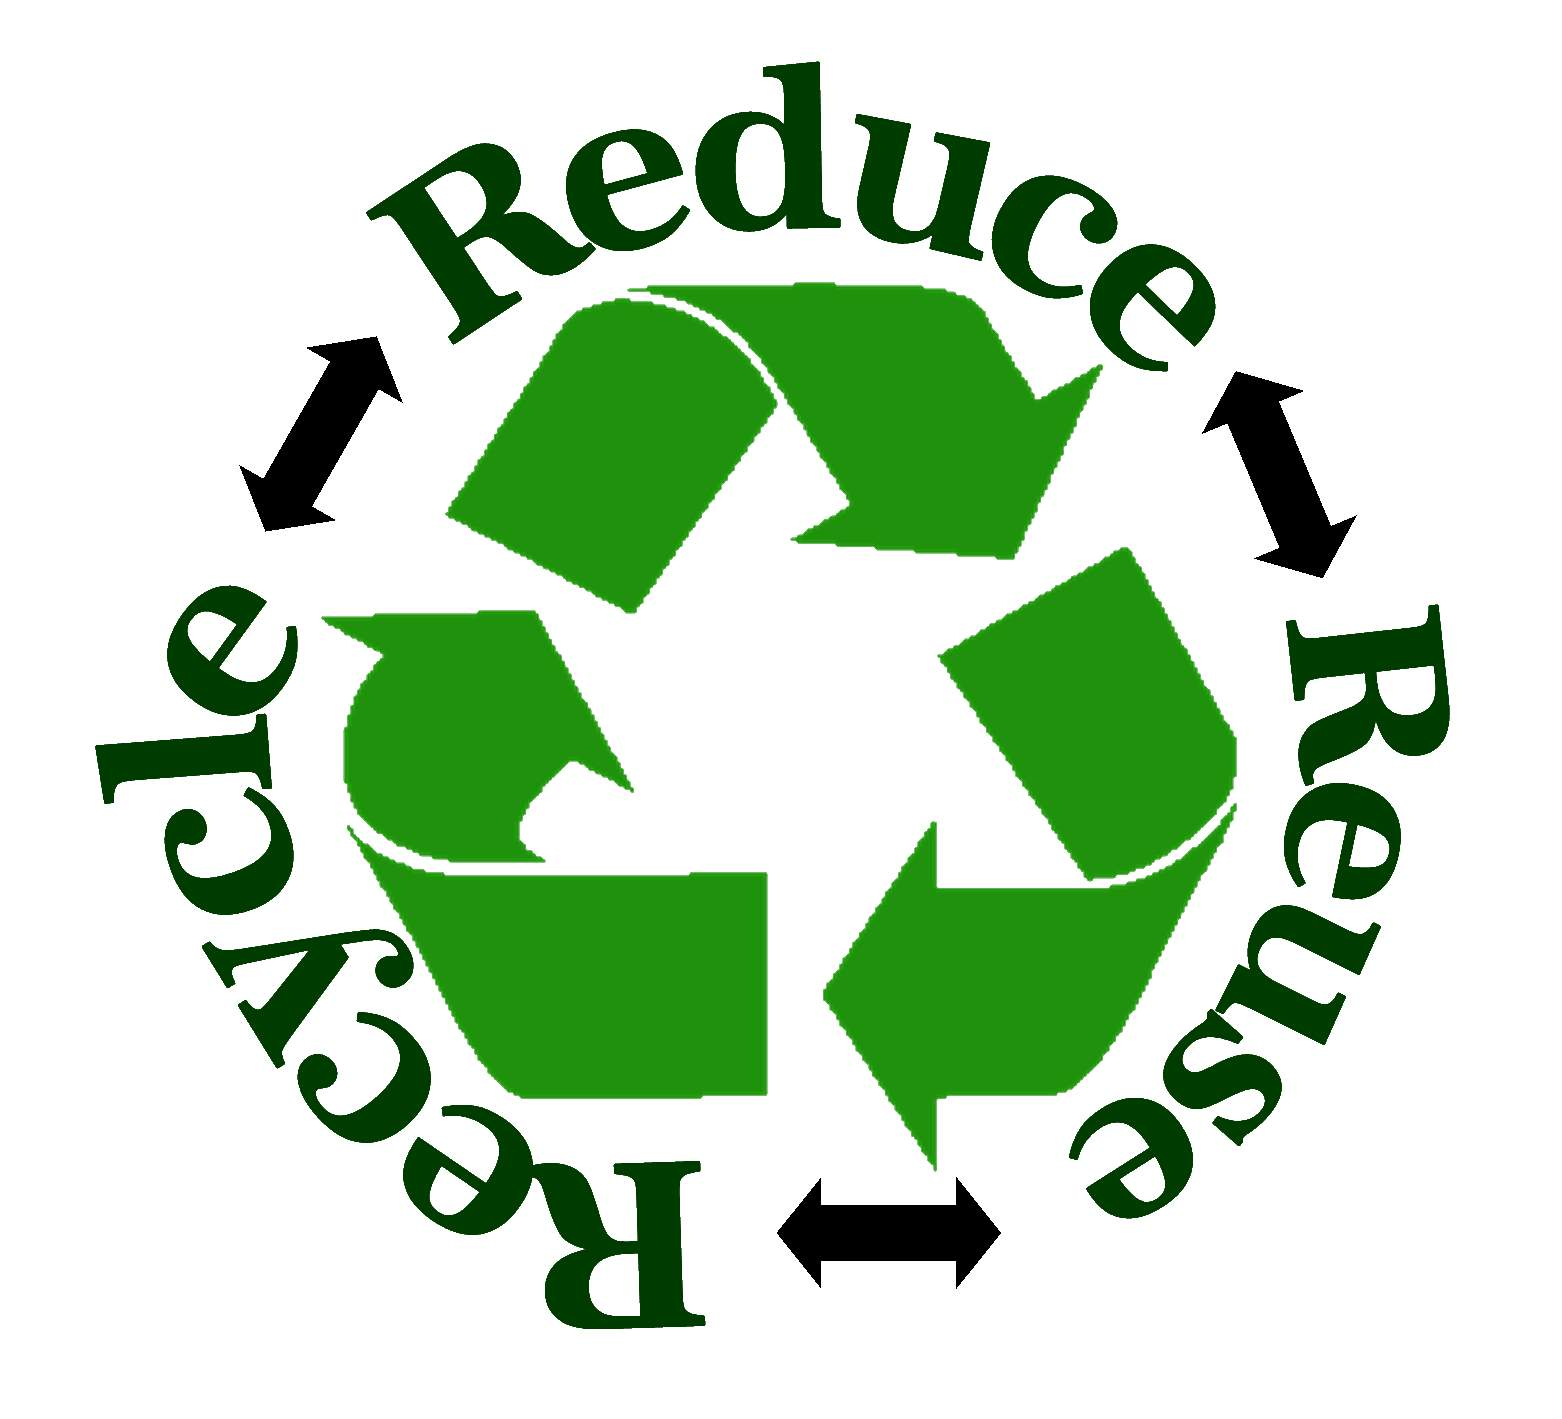 http://1.bp.blogspot.com/--zZBkgR556s/VFbMe1oorZI/AAAAAAAAB0Q/17jJSvG1qgI/s1600/recycle_logo_copy.gif